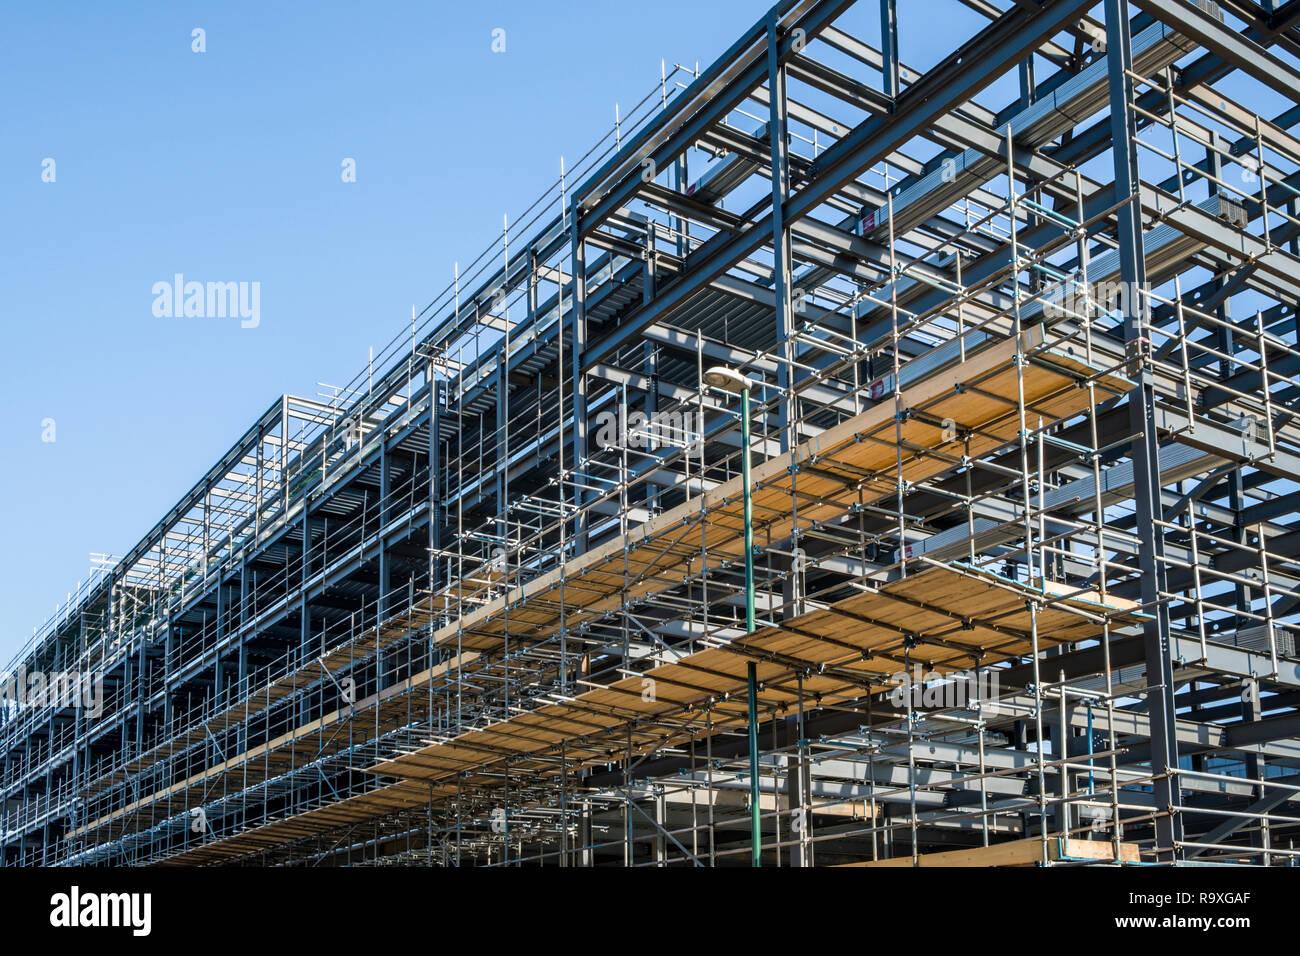 Scaffolding platform on a steel girder framework for a new building on a construction site, Nottingham, England, UK - Stock Image